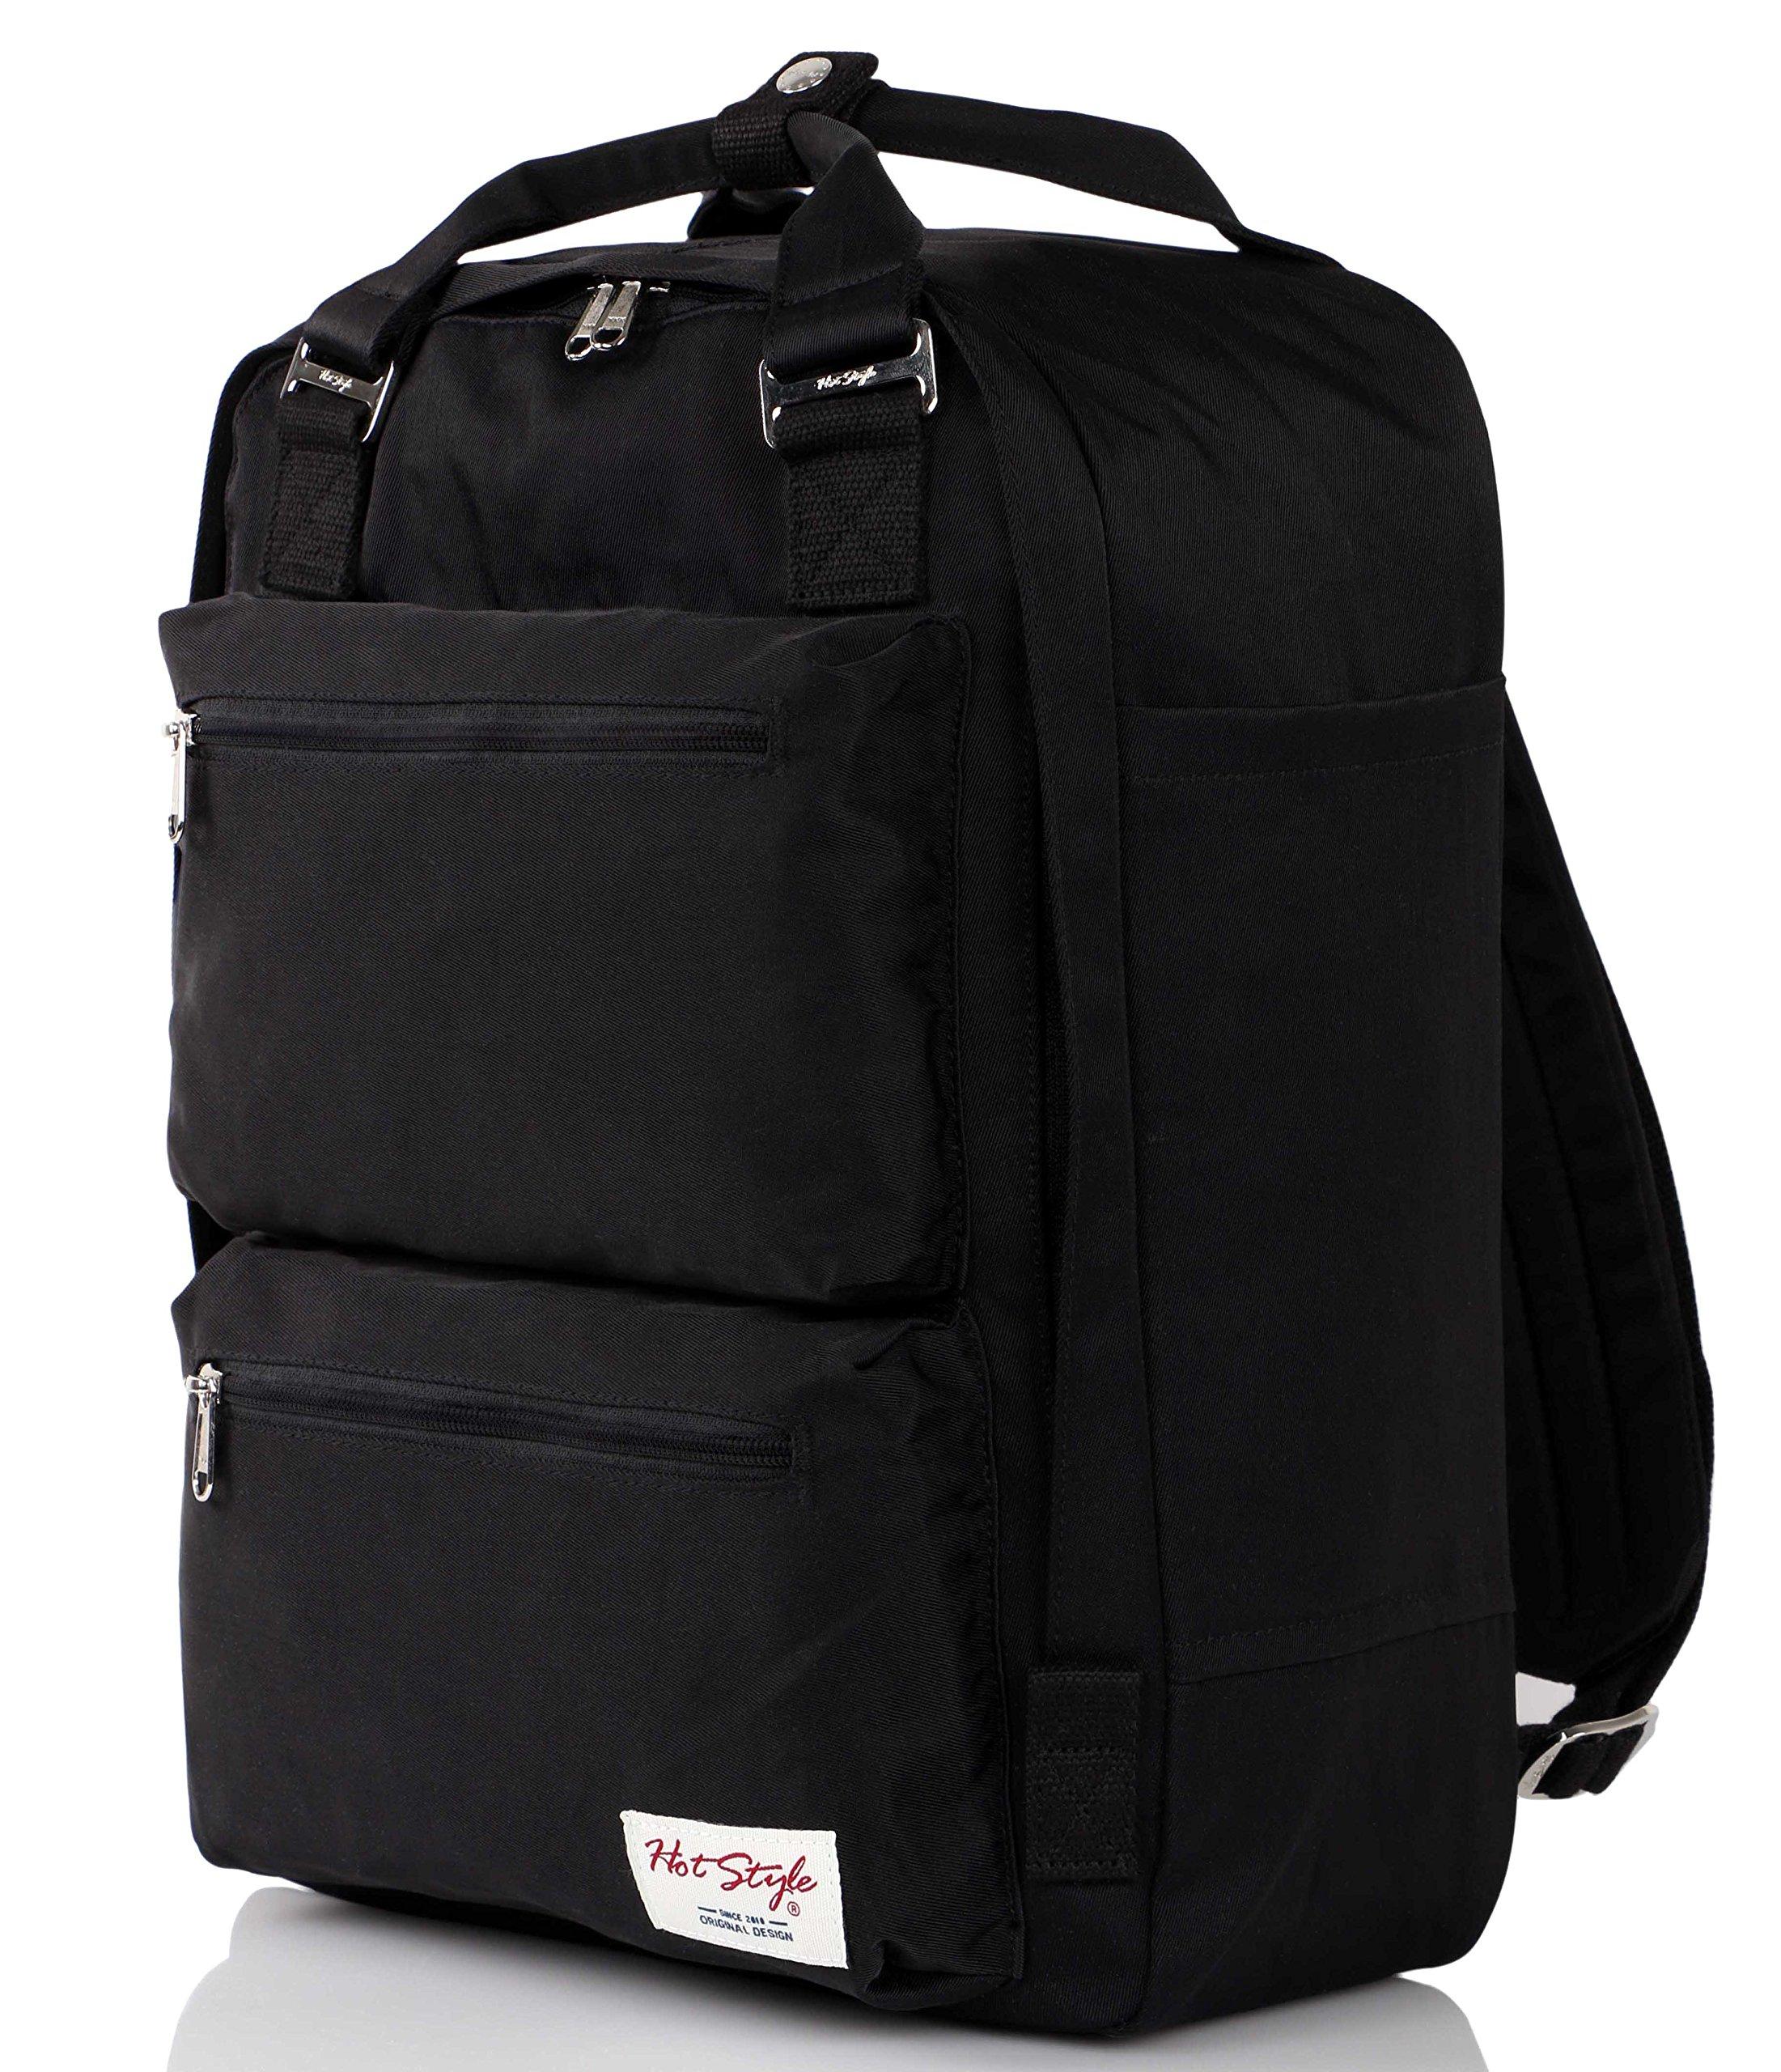 HotStyle DayBreak Waterproof Travel Backpack Handbag holds 15'' Laptop - Black